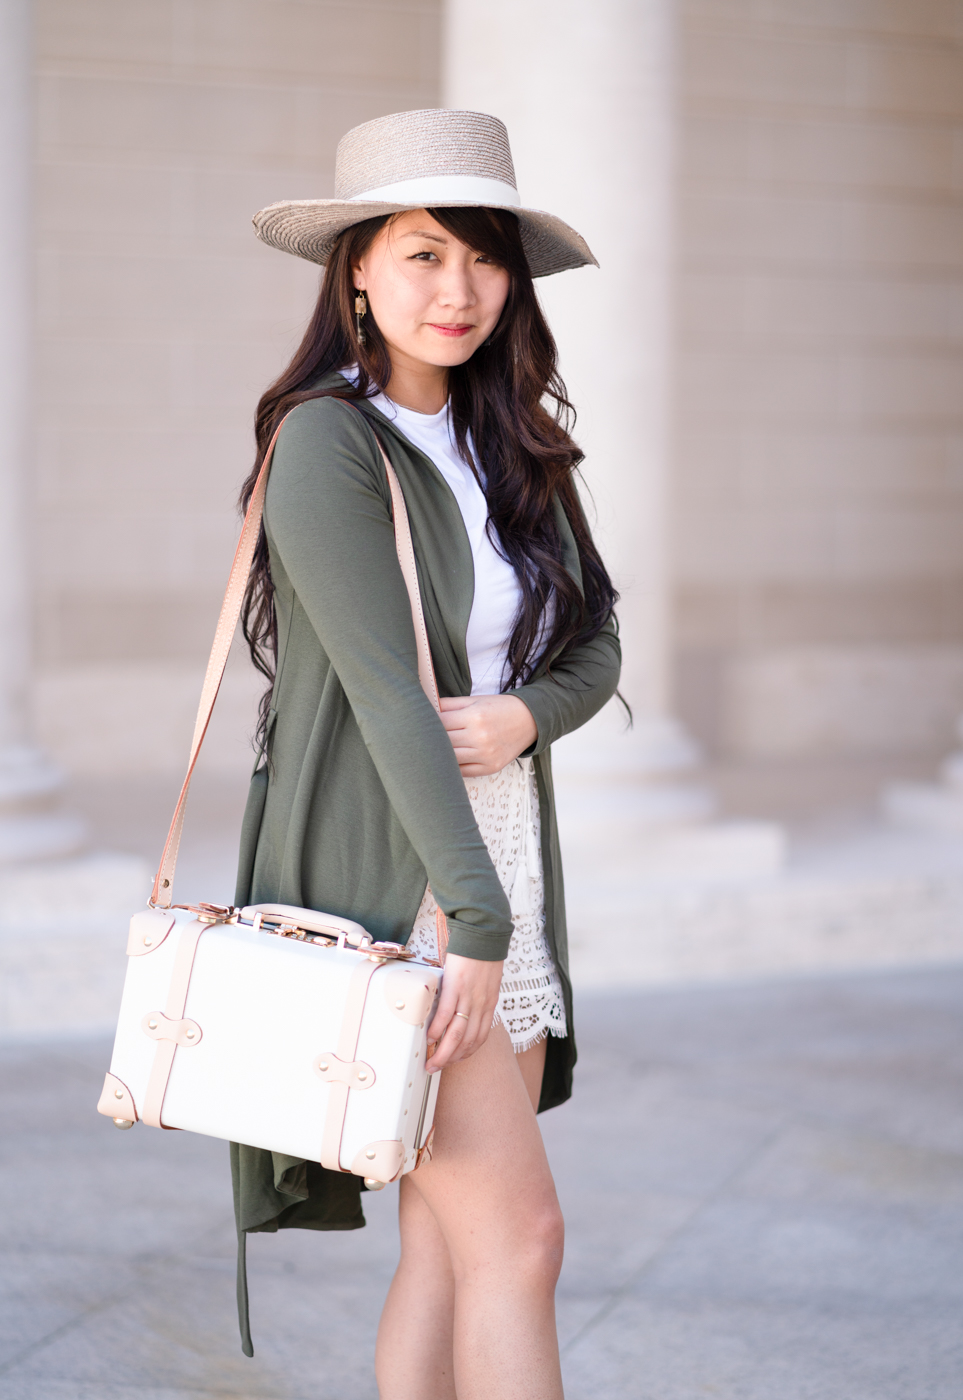 Minimal Fashion | The Chic Diary